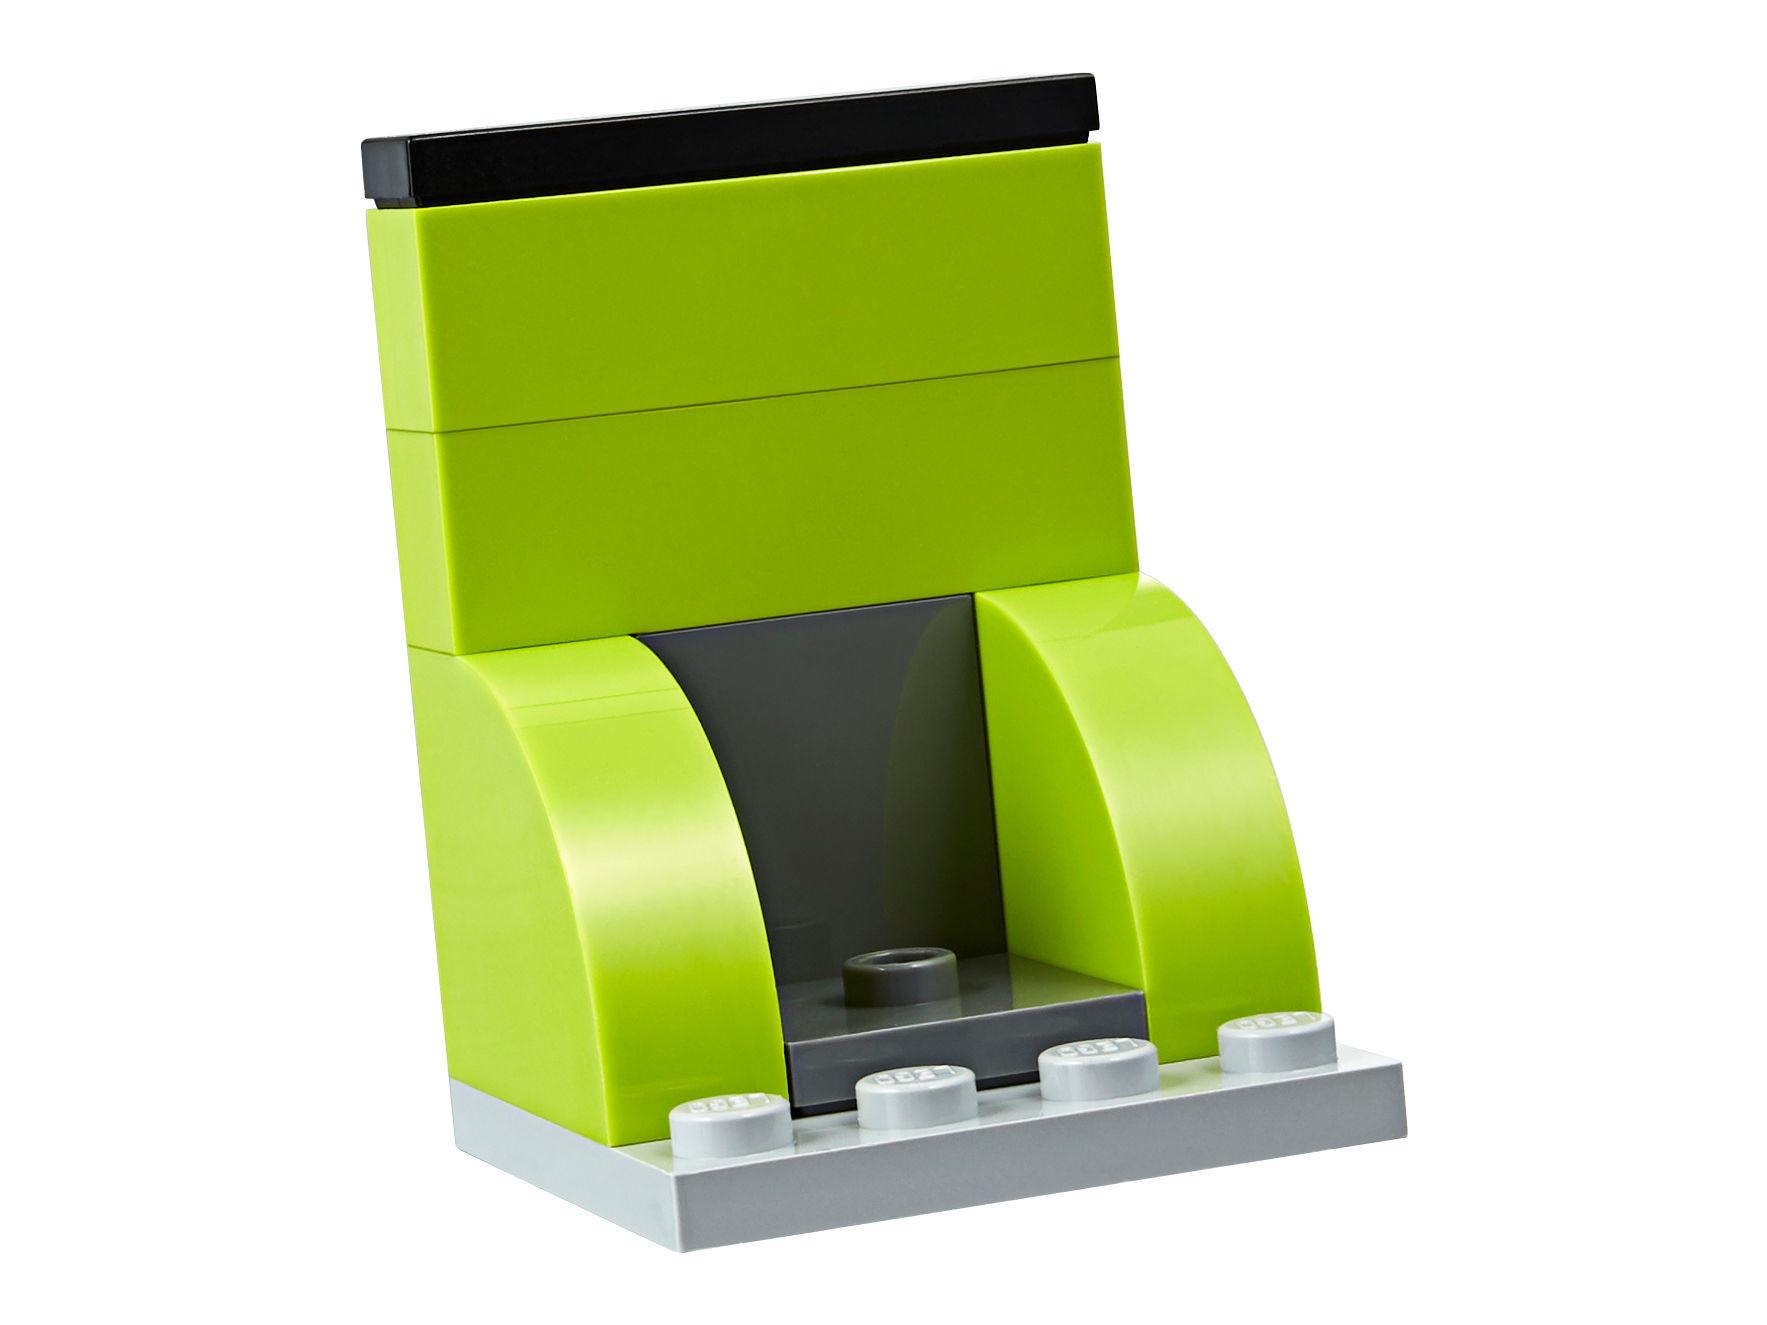 Lego Police Brick Box